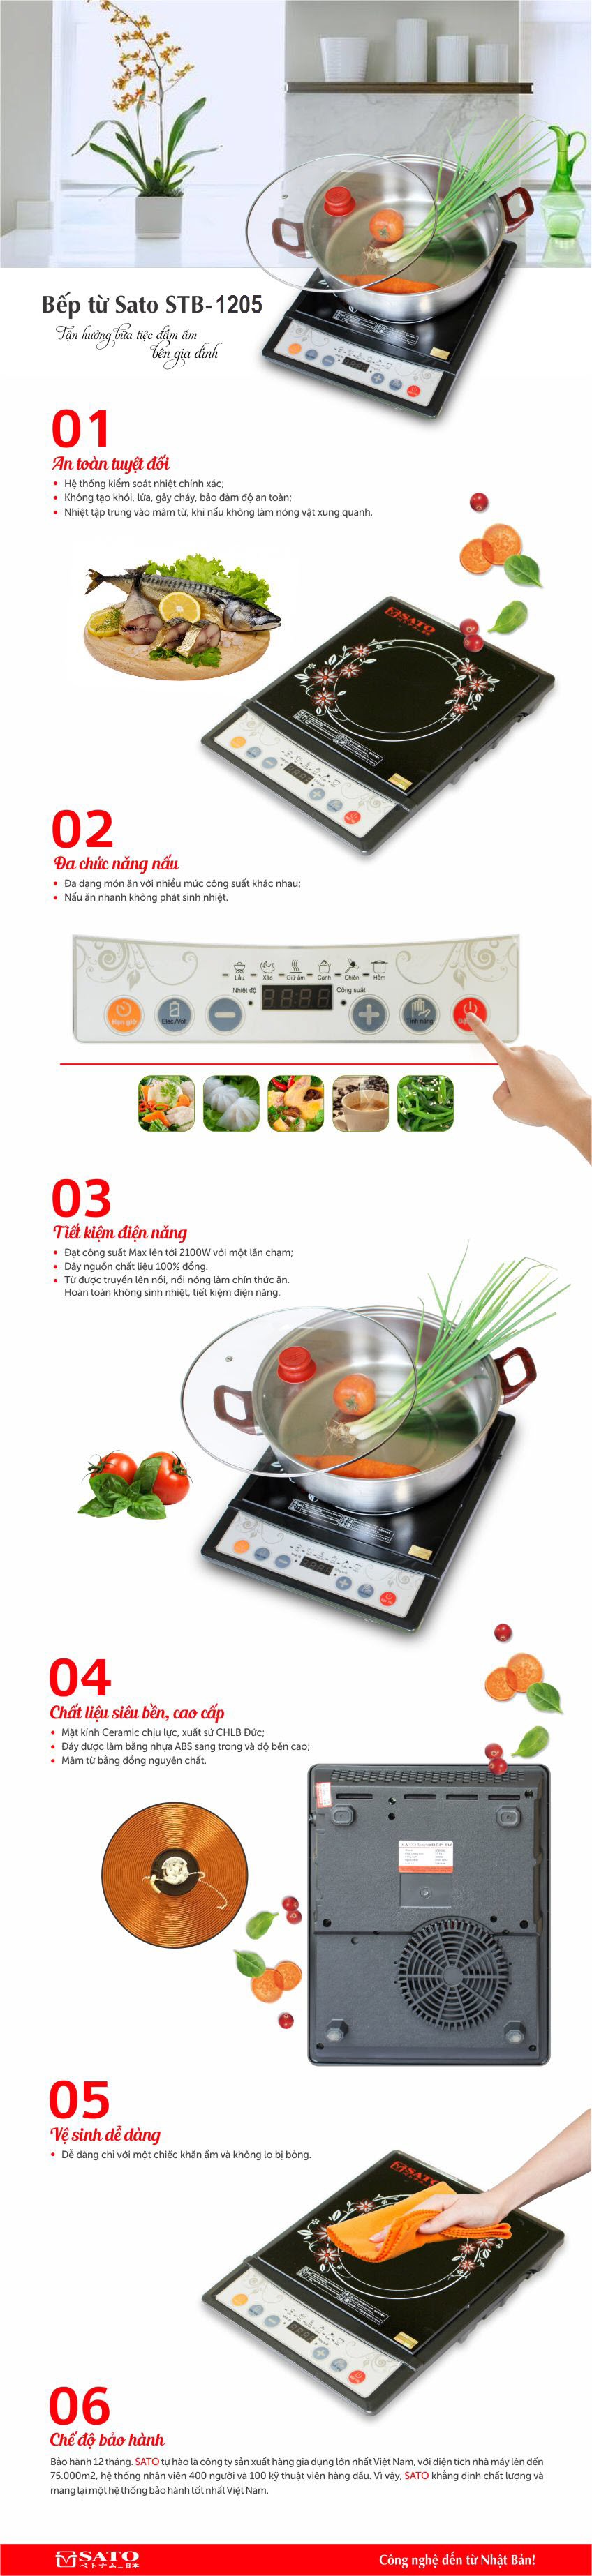 Bếp từ Sato STB-1205